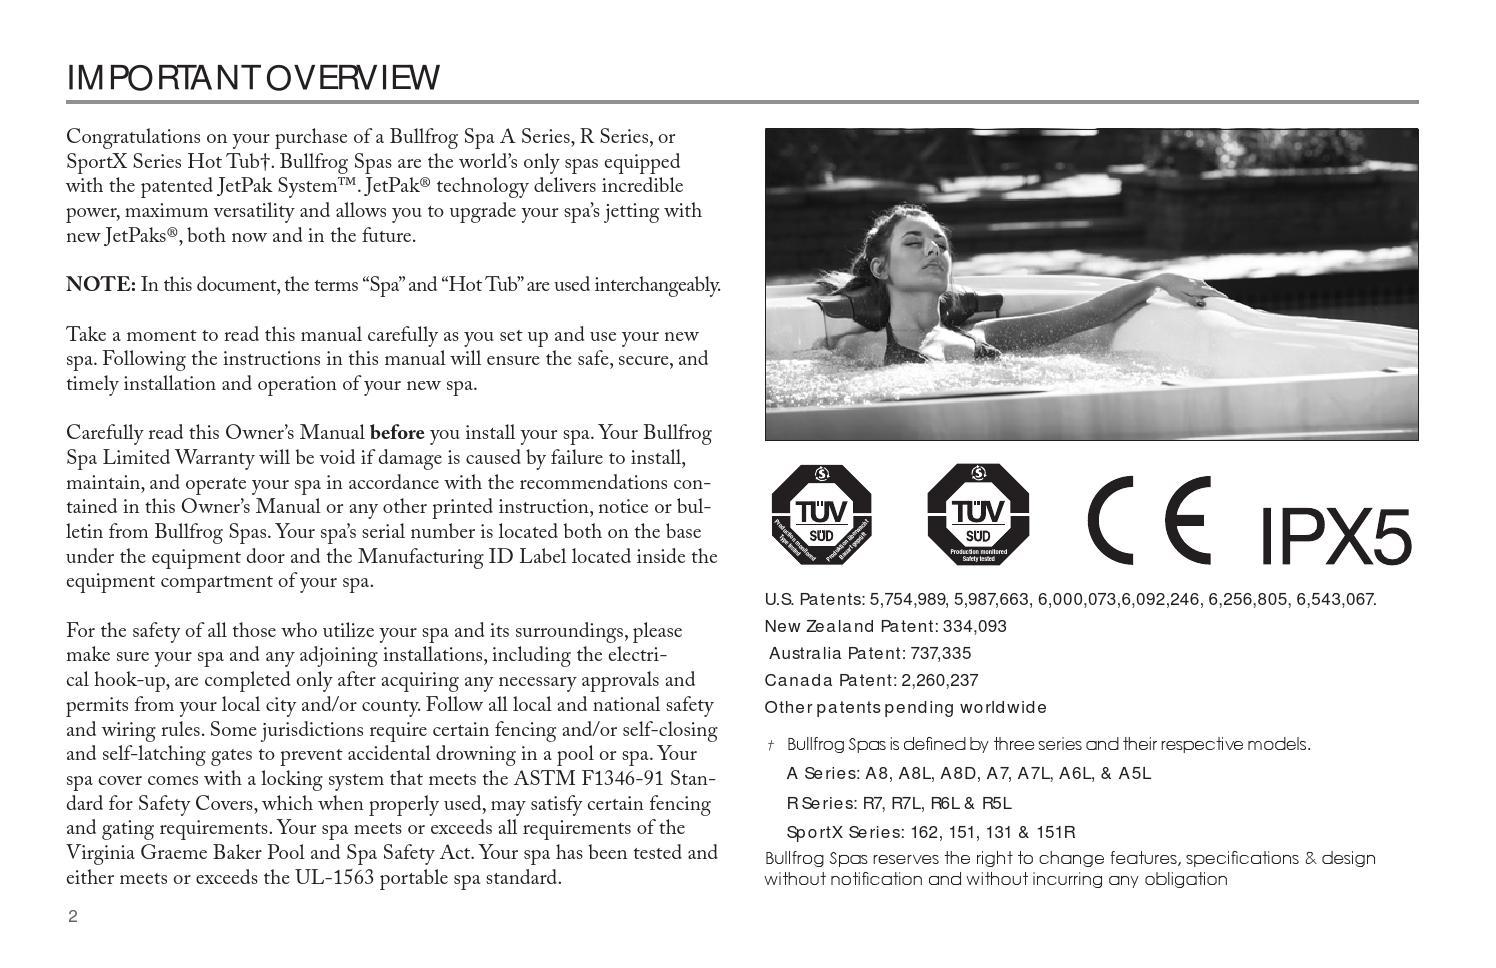 bullfrog manual 2013 by envirosmarte hot tubs swim spas issuu rh issuu com Sunrise Spa Wyomissing PA Sunrise Spa Flushing NY Yelp